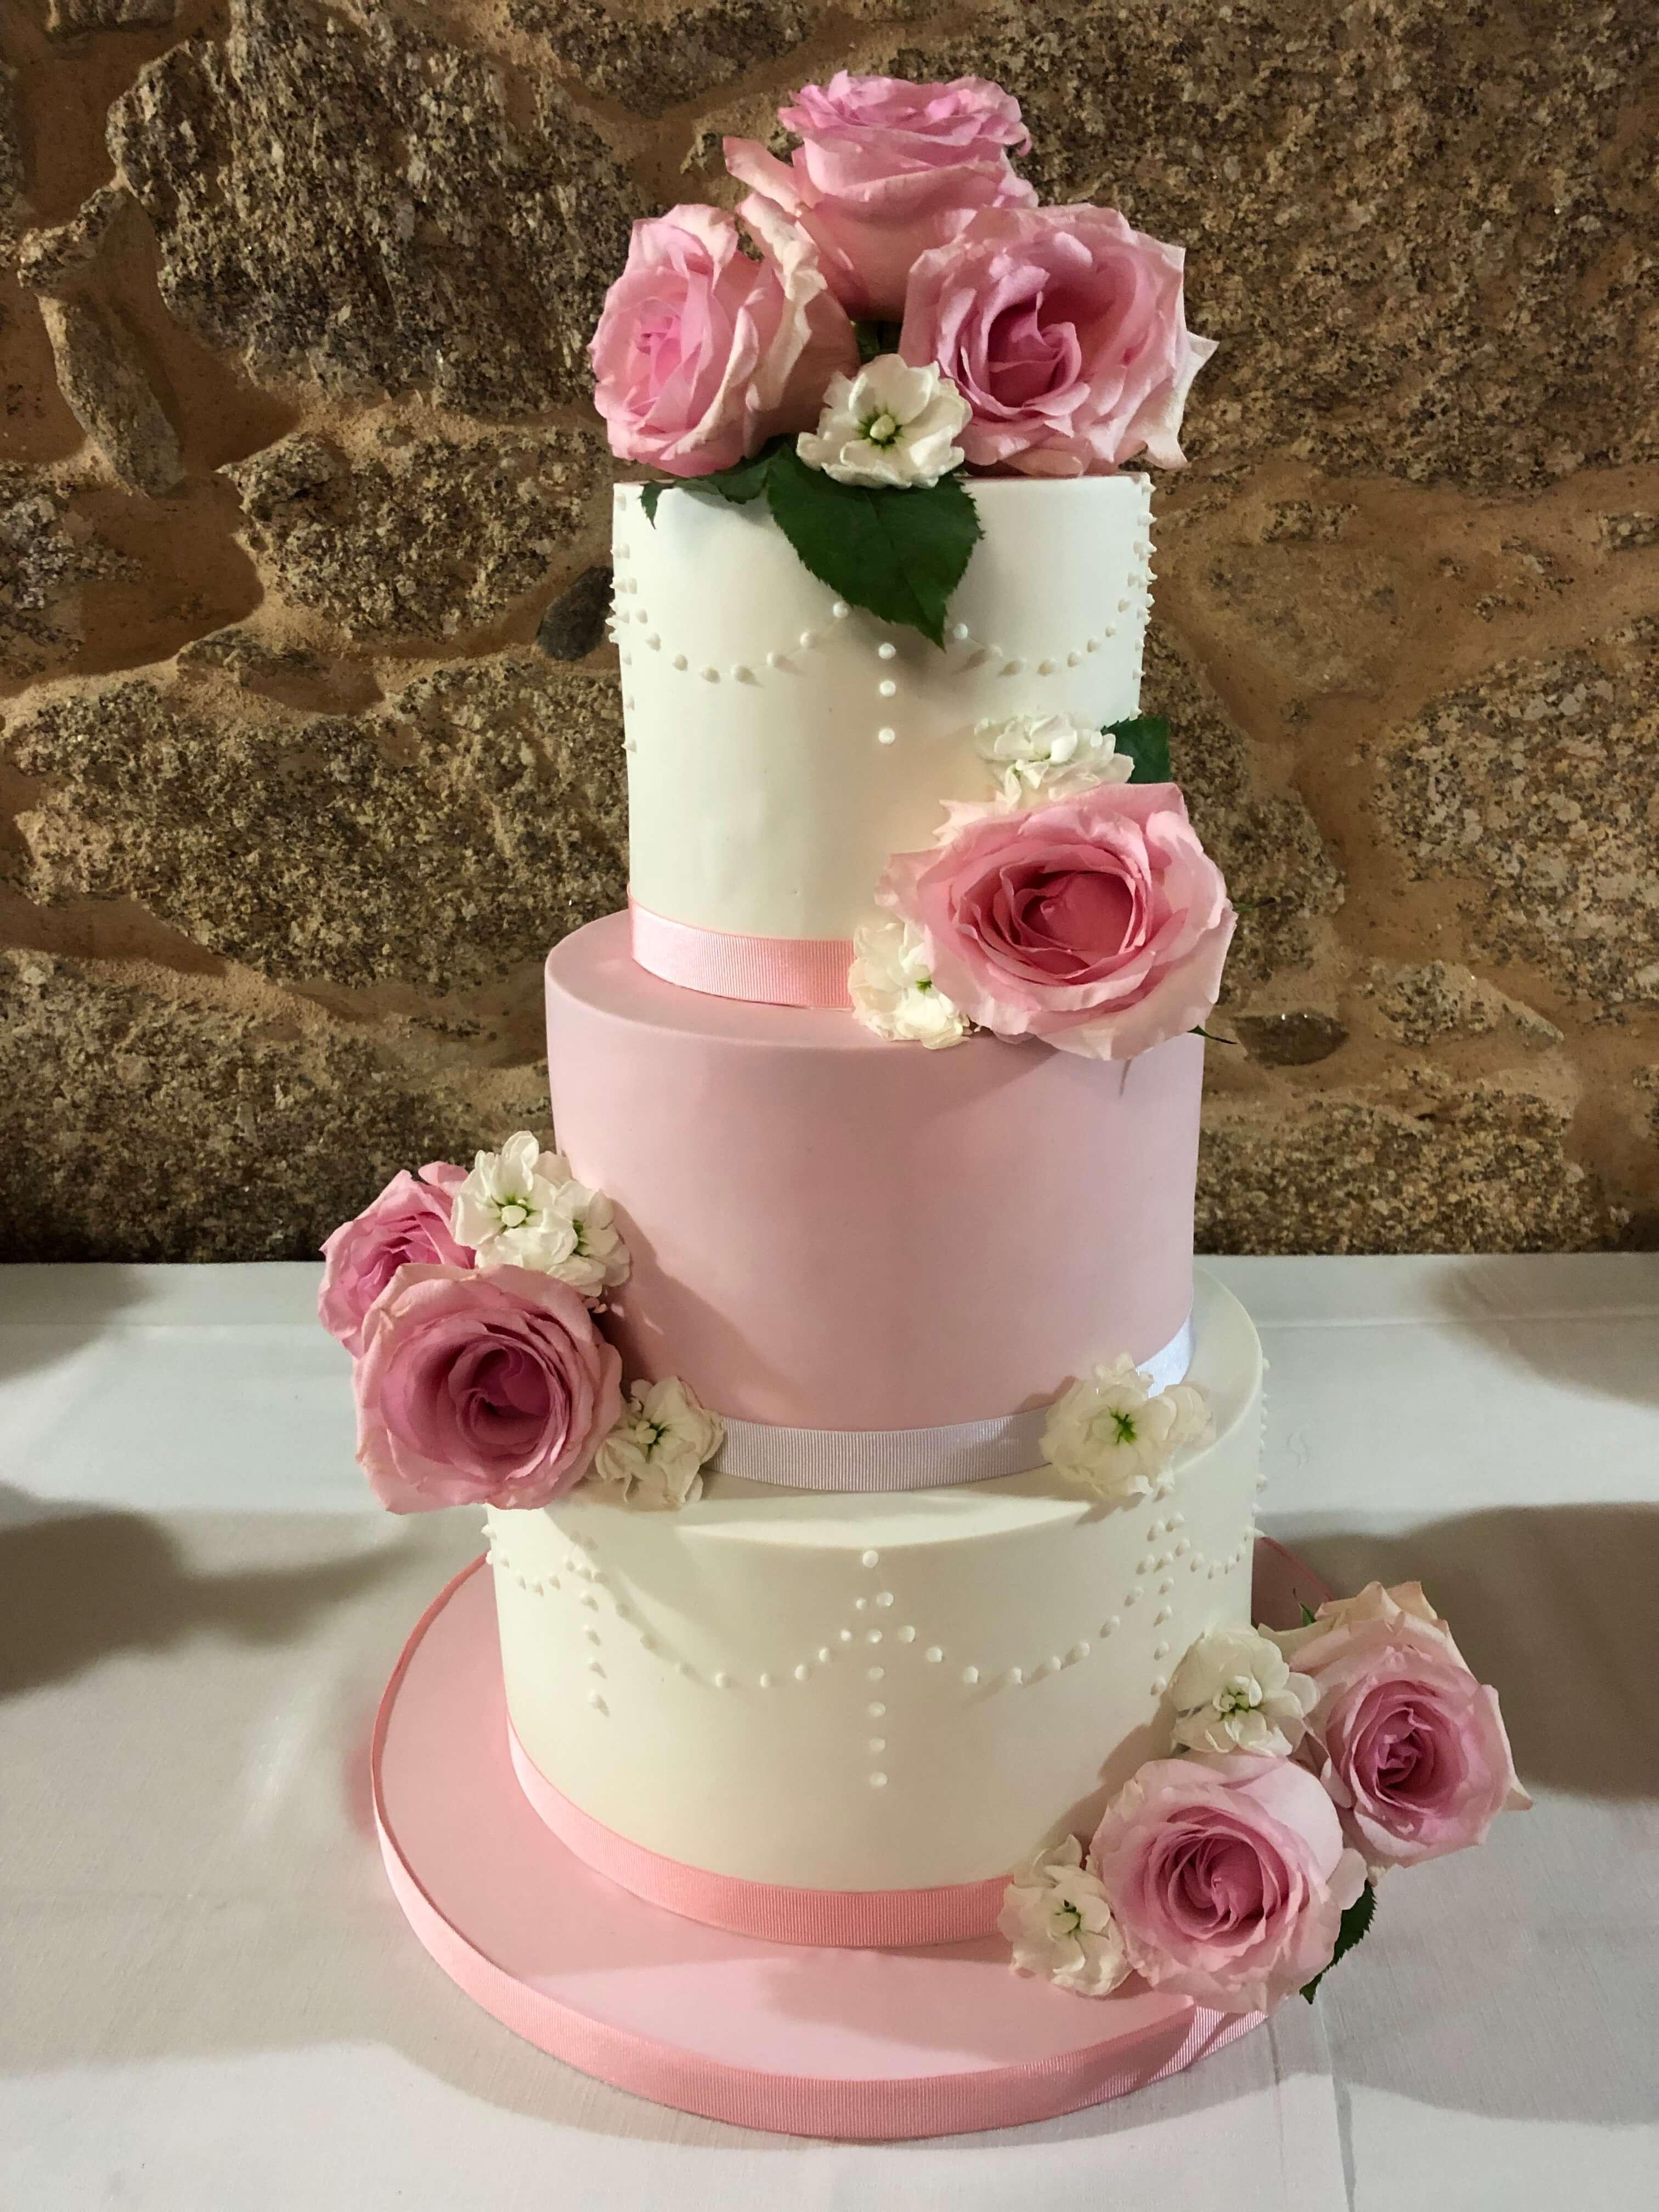 tarta bonita coruña boda personalizad comunión bautizo coruña